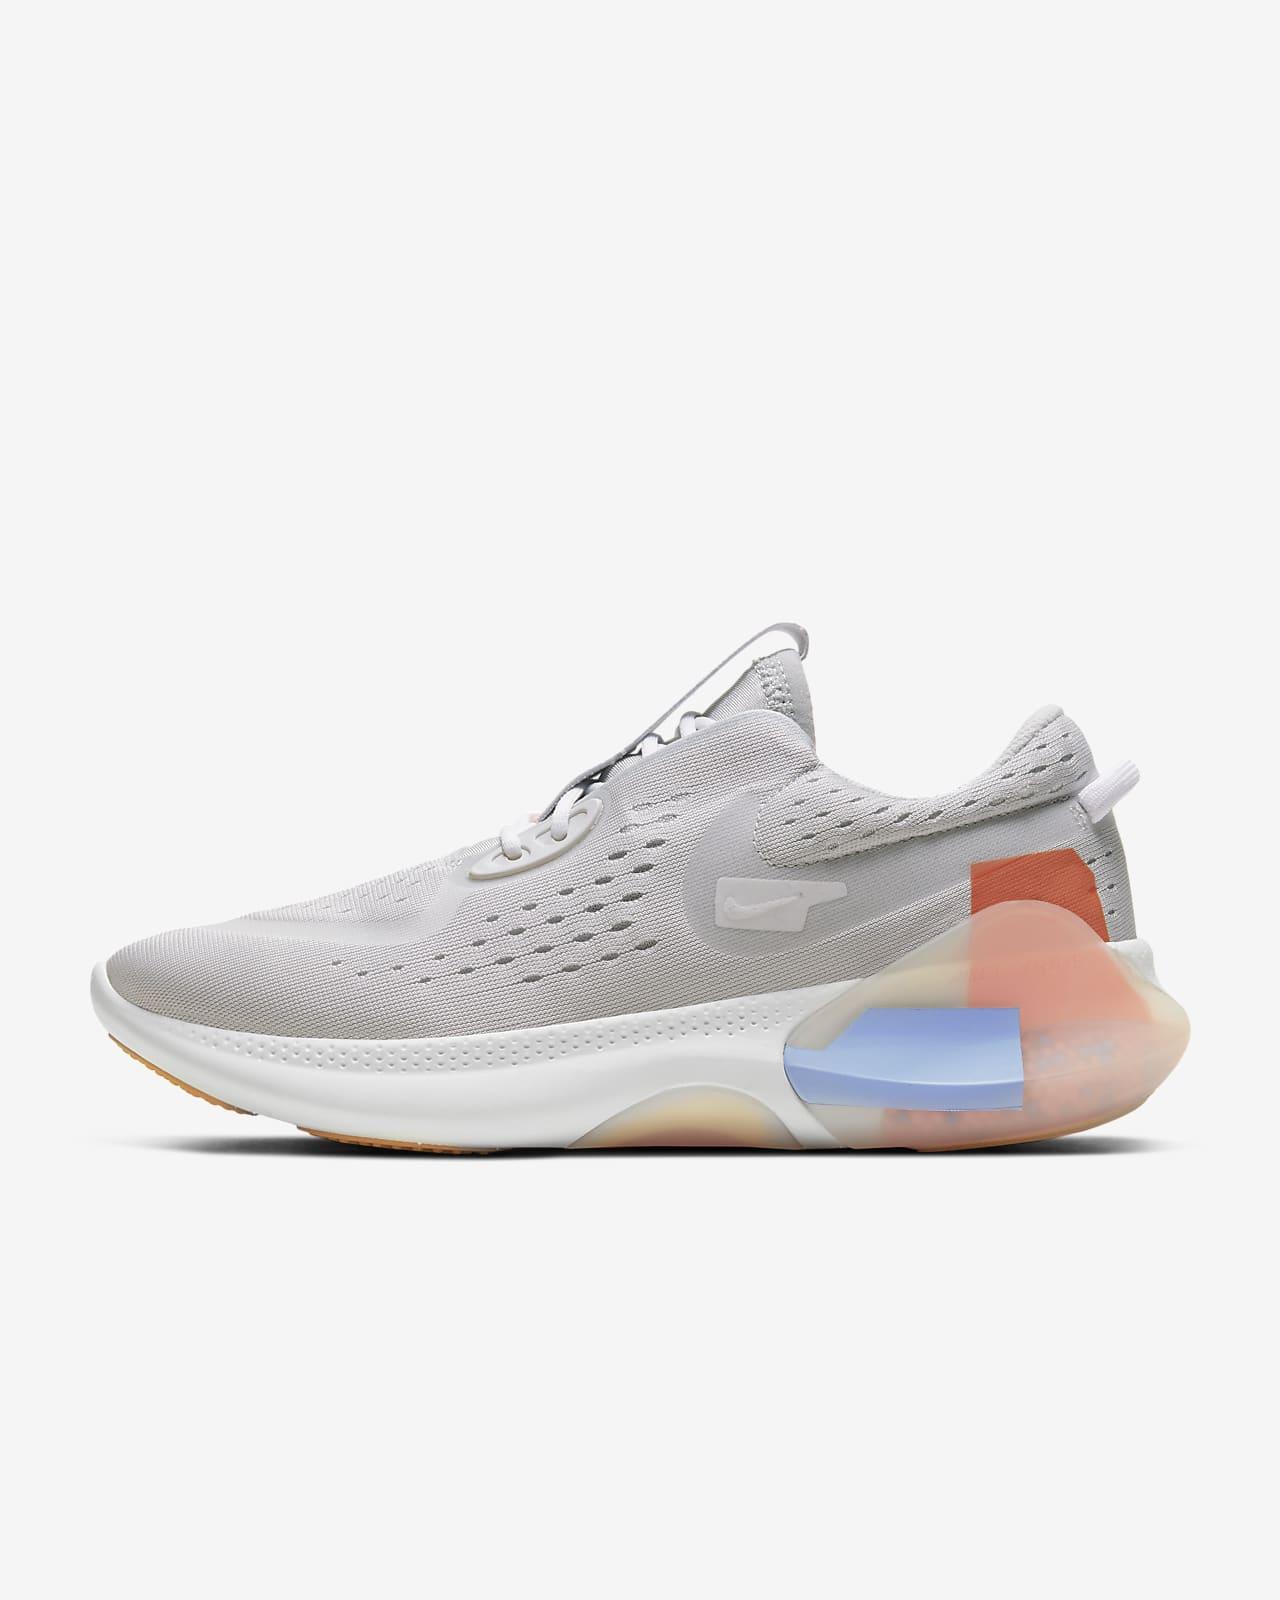 Chaussure de running Nike Joyride Dual Run Premium pour Femme